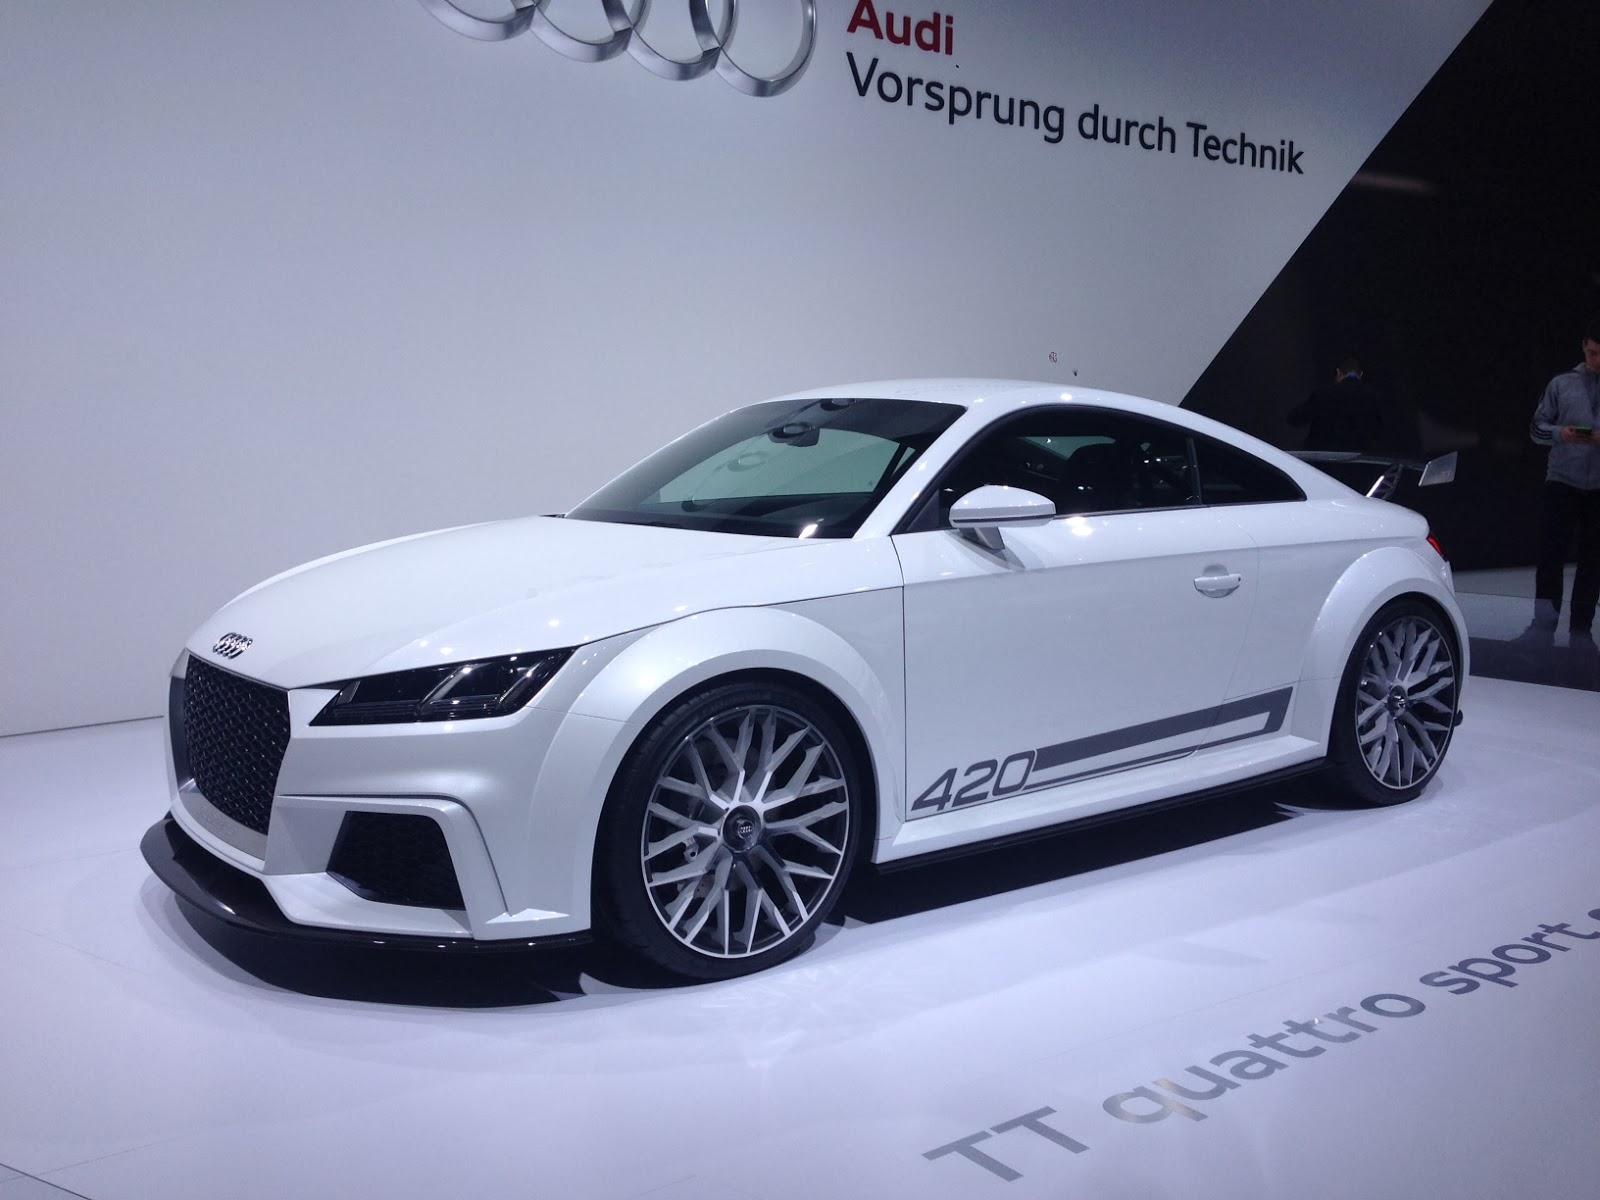 Audi TT 420 at Geneva Motor Show